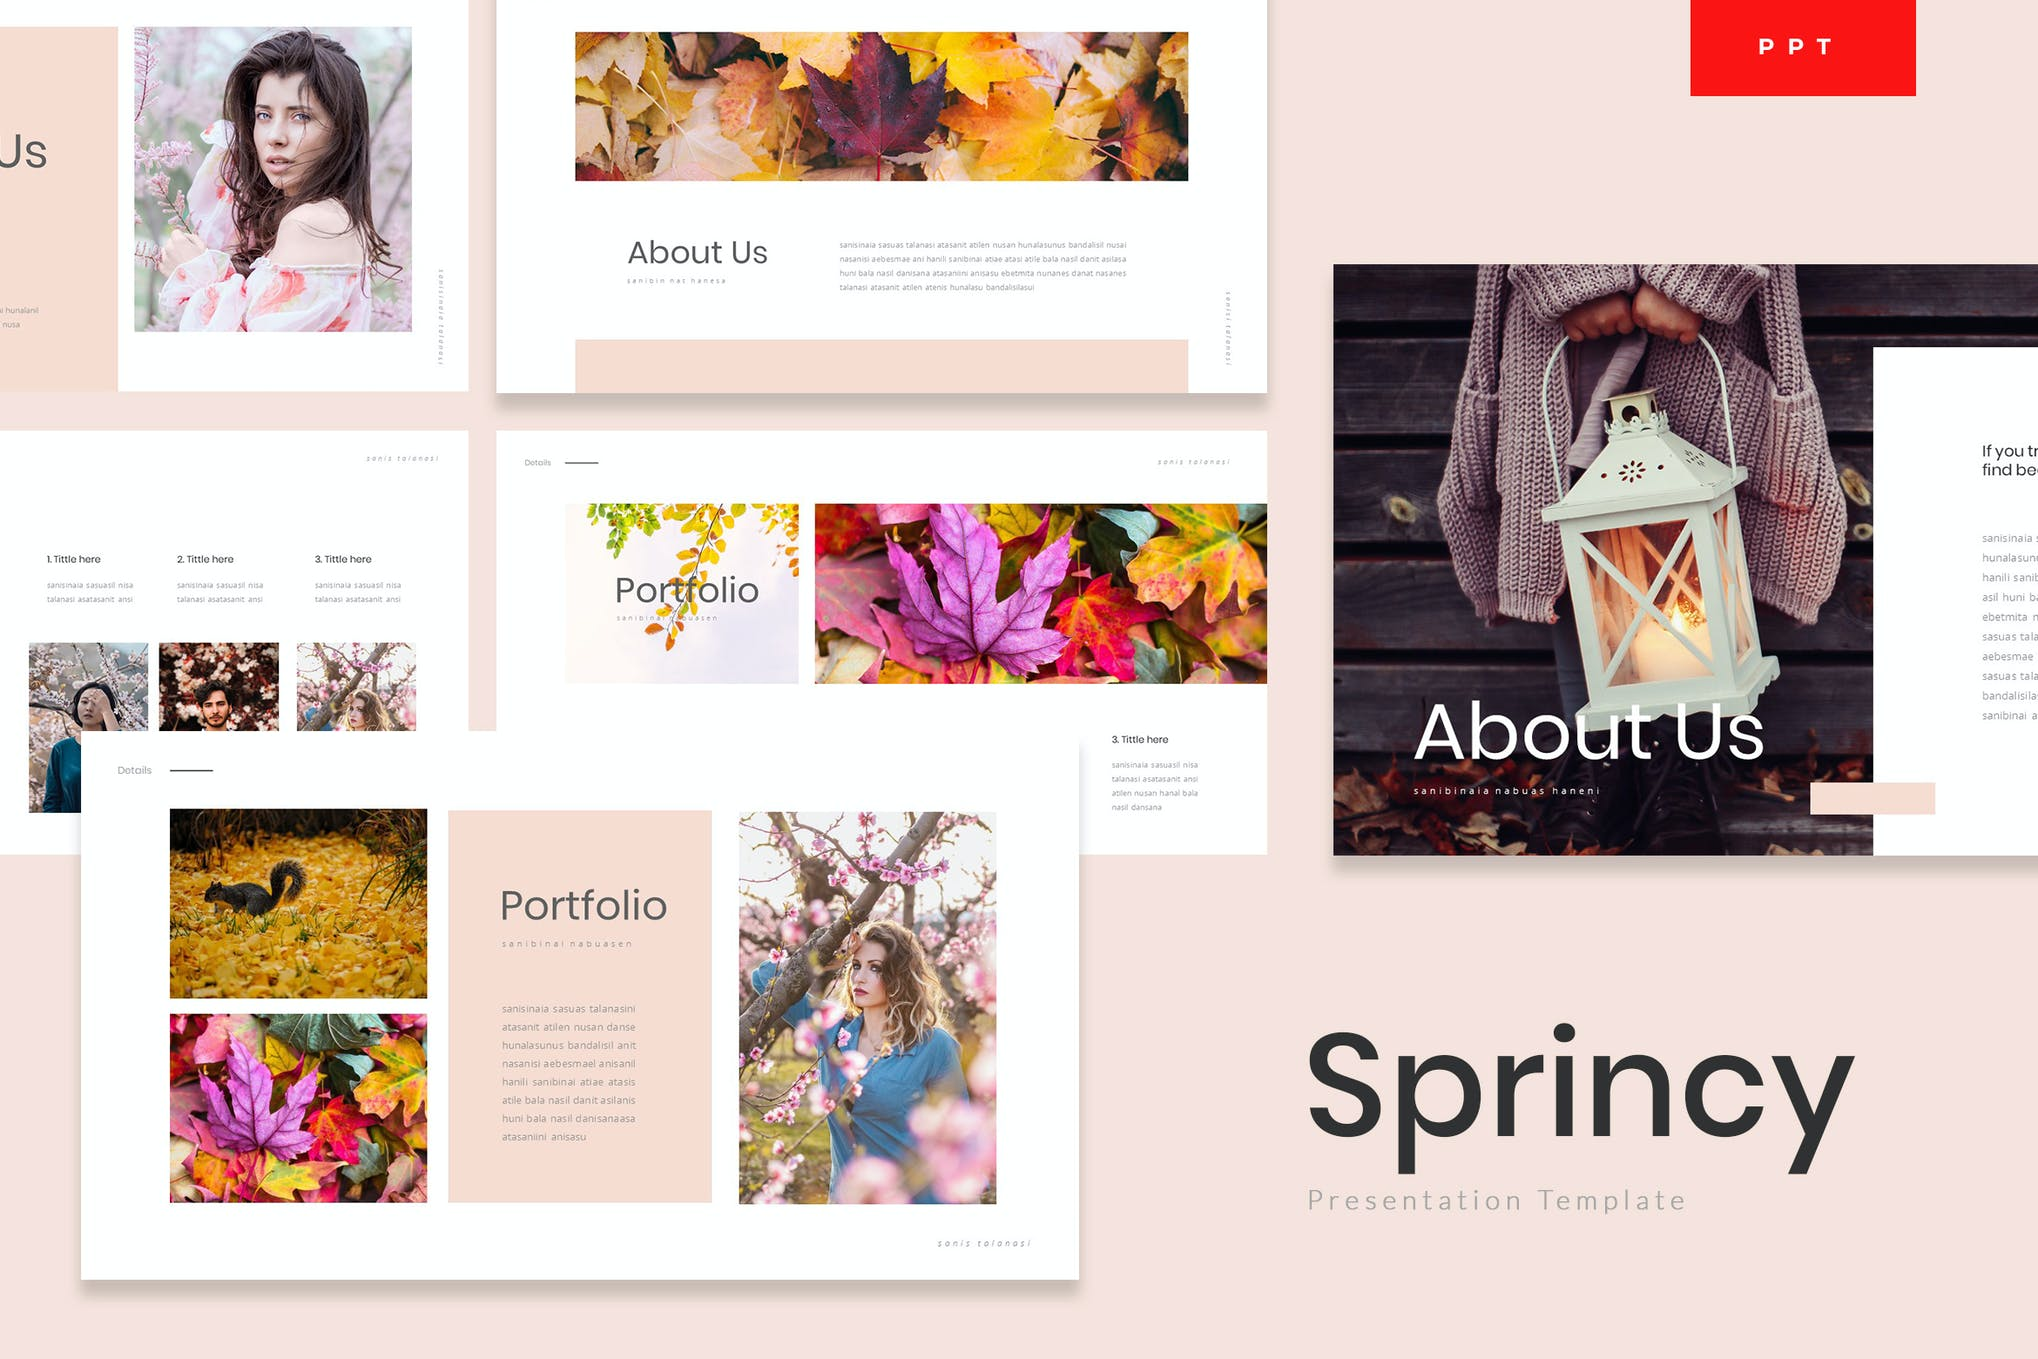 Sprincy - Autumn Powerpoint Template